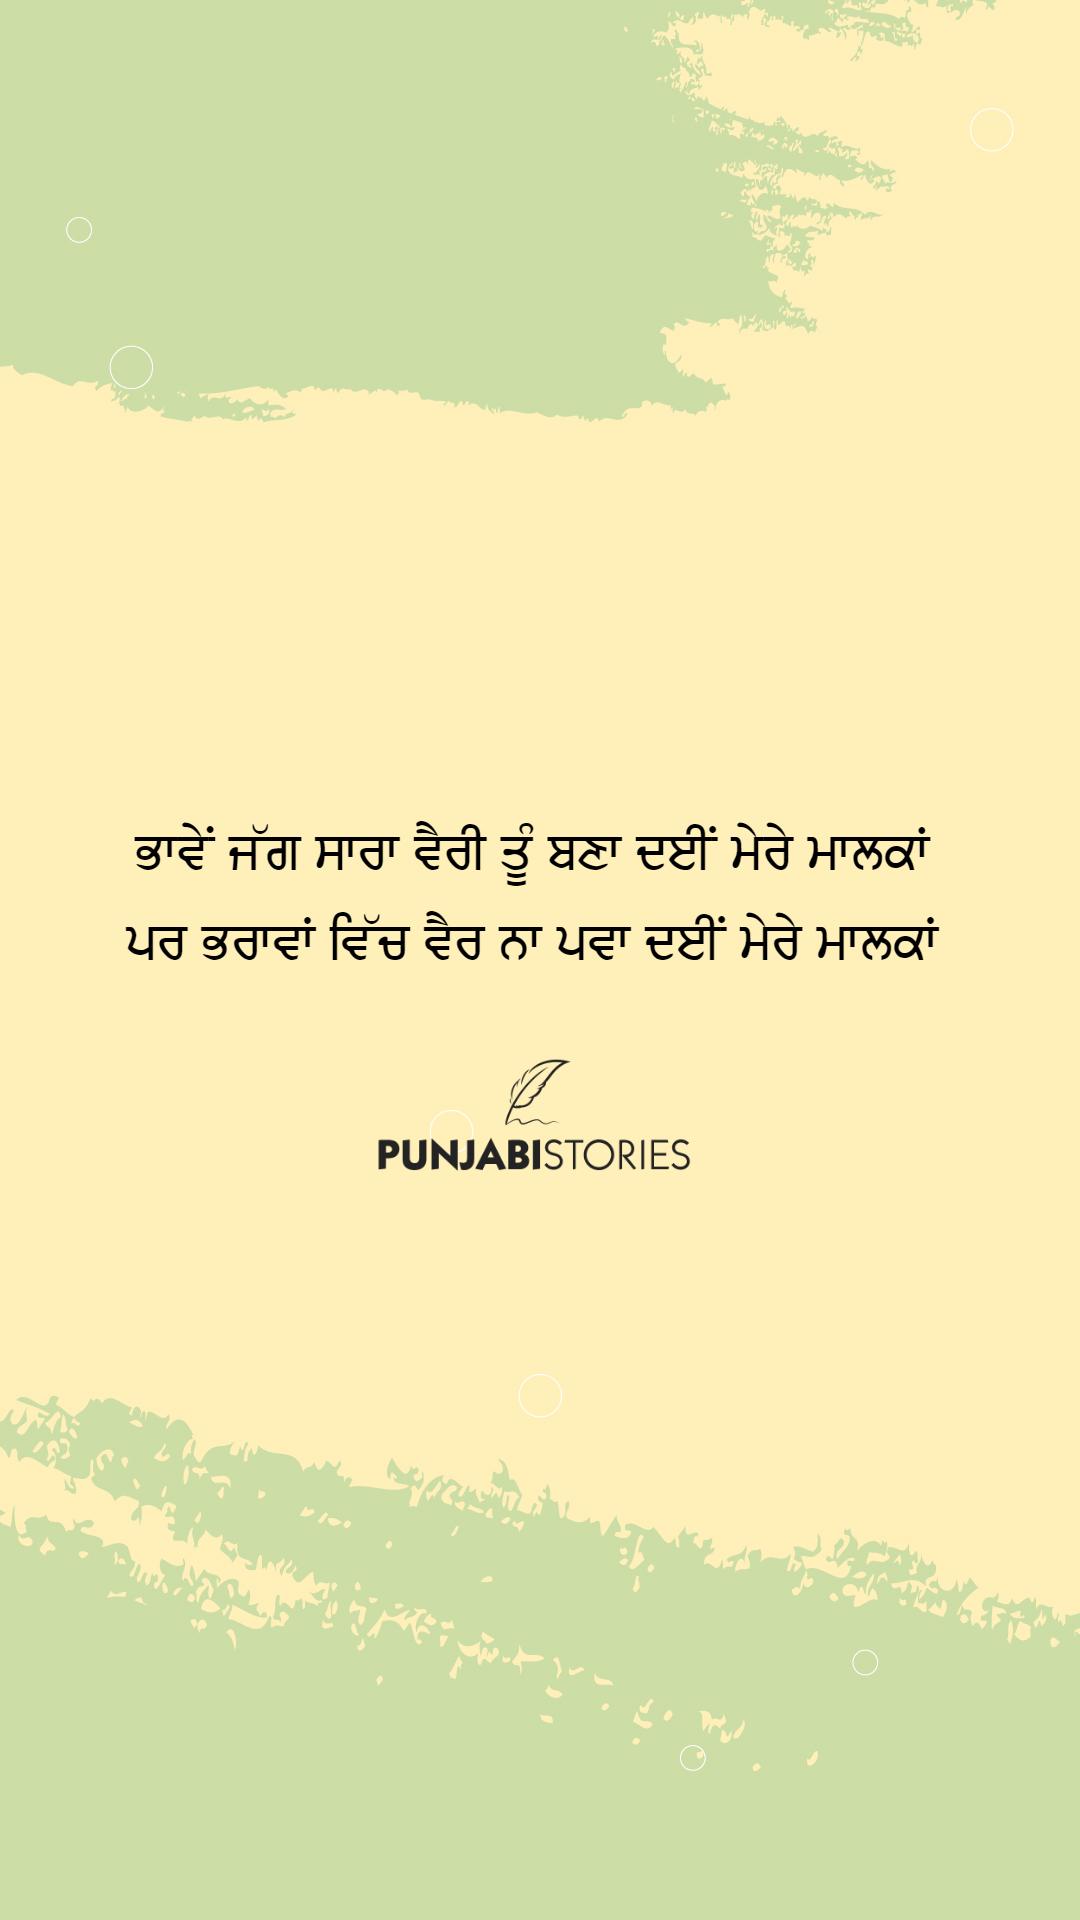 Punjabi Status 2021, Latest 2021 Punjabi Status for Whatsapp